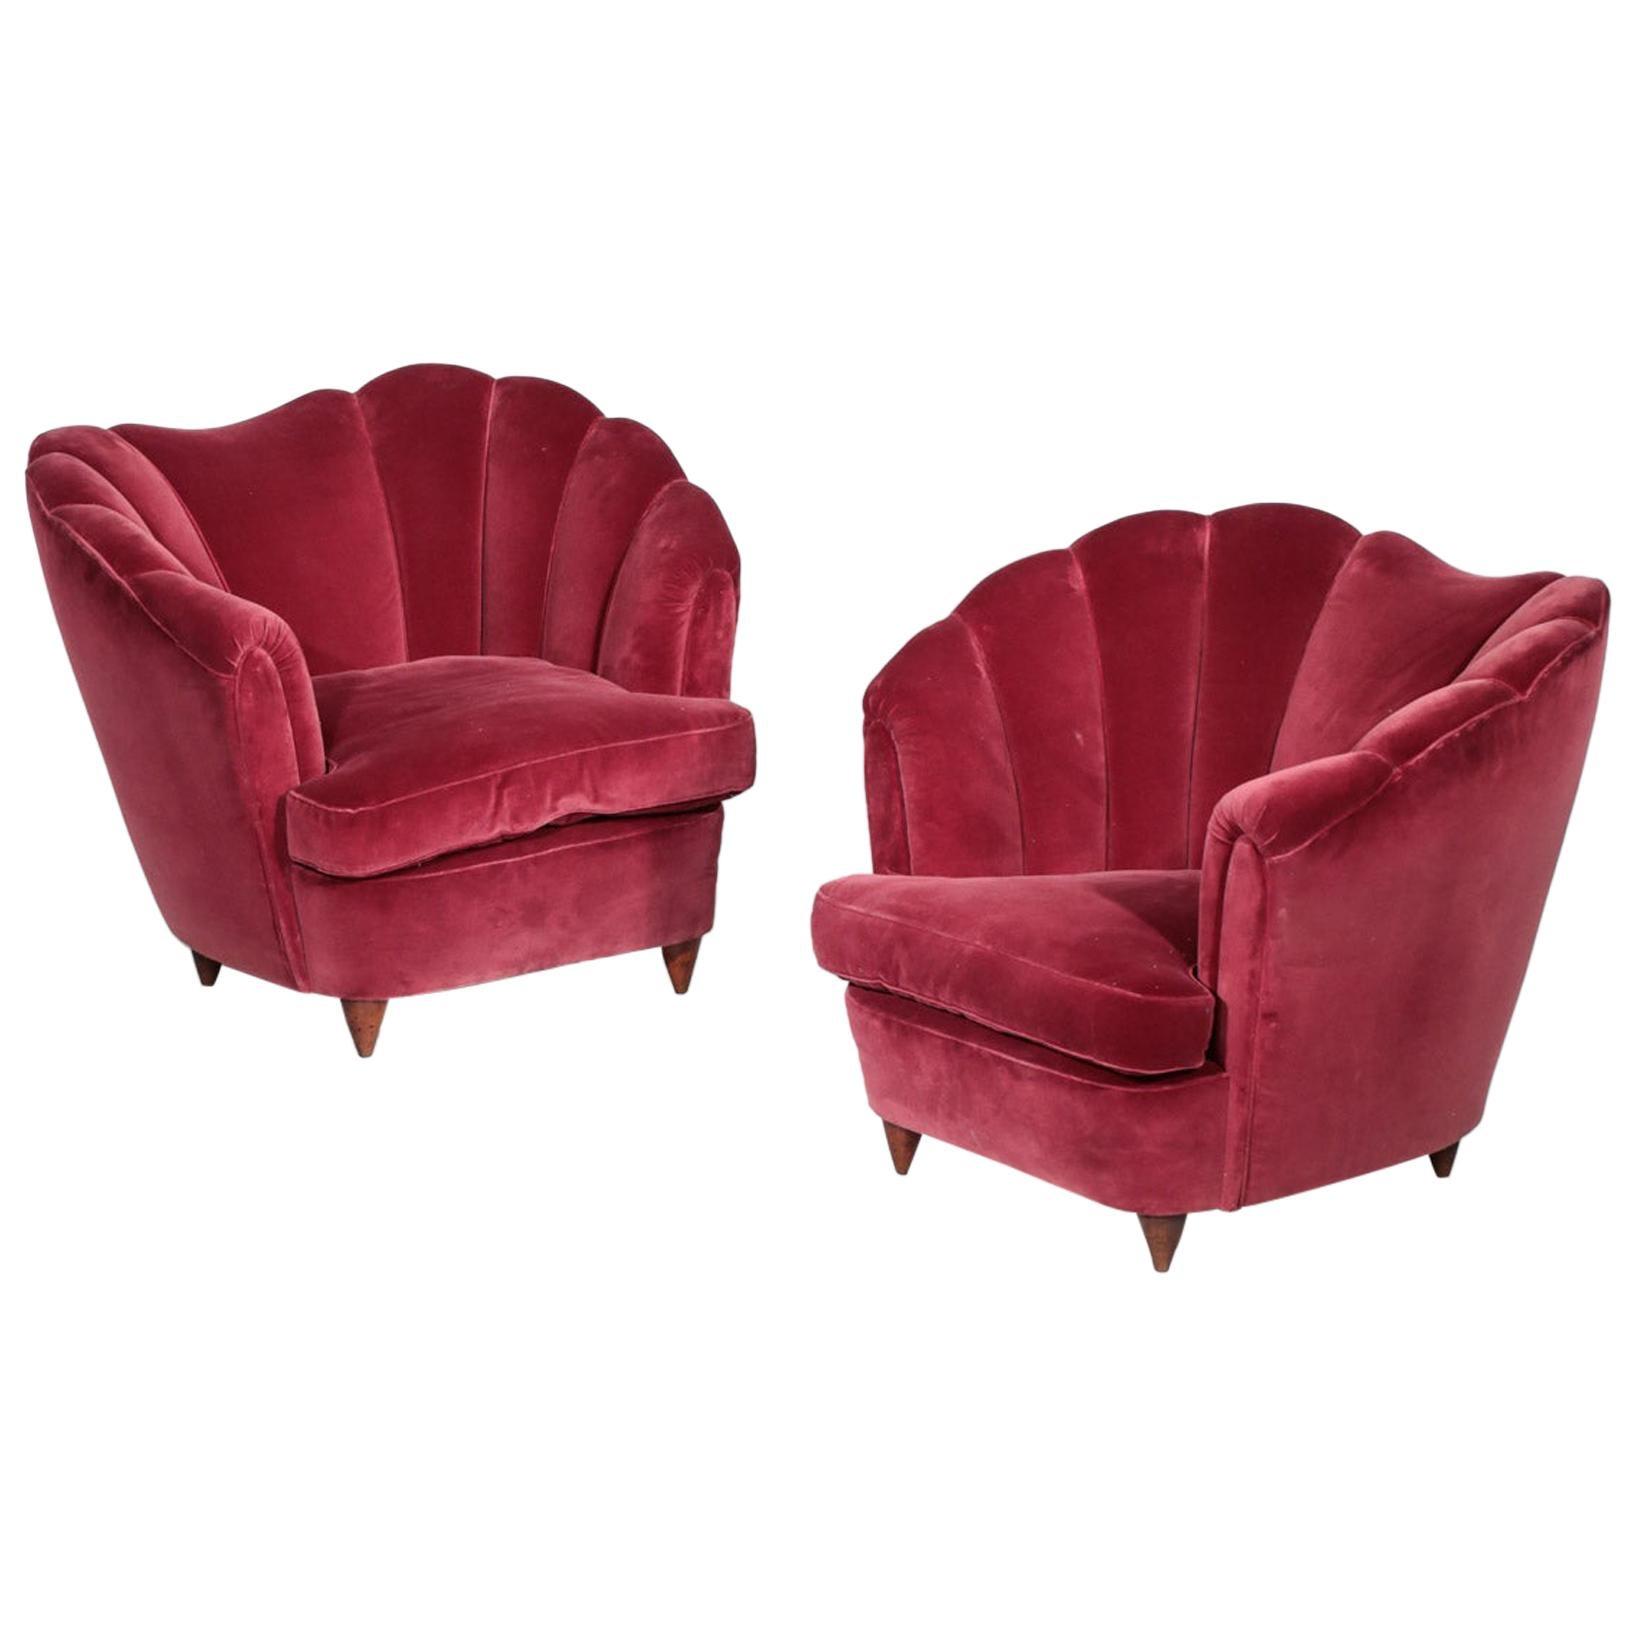 Pair of Italian Armchair in the Style of Gio Ponti Burgundy Velvet